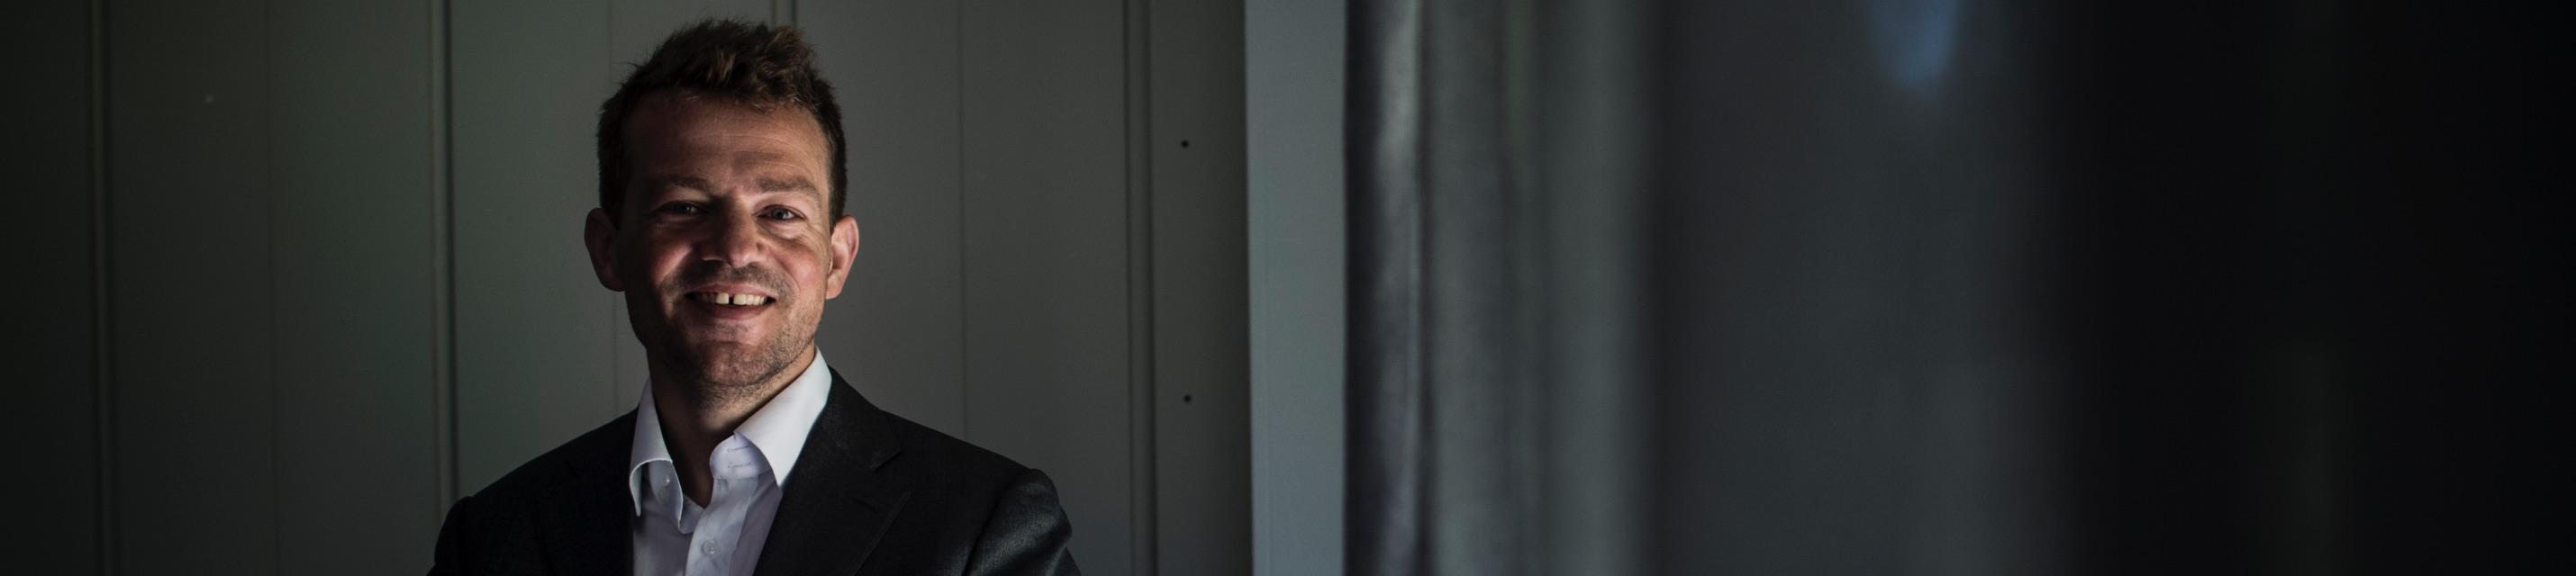 Esben Østergaard - Contact